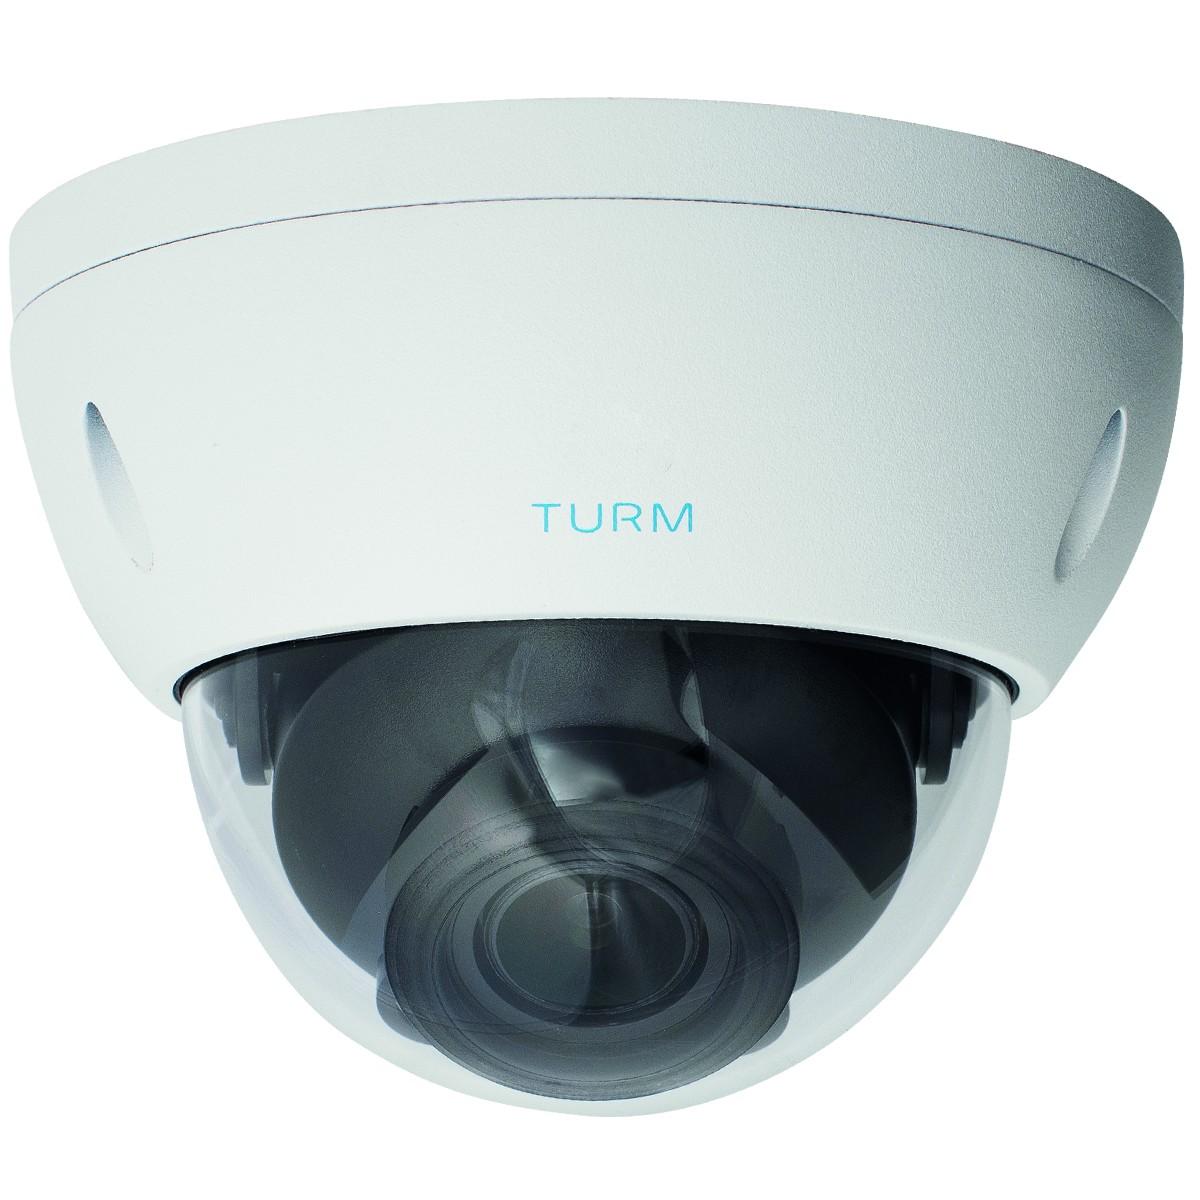 TURM IP Professional 4 MP Dome Kamera mit 40m Nachtsicht und 2.7-13.5 mm Motorzoom